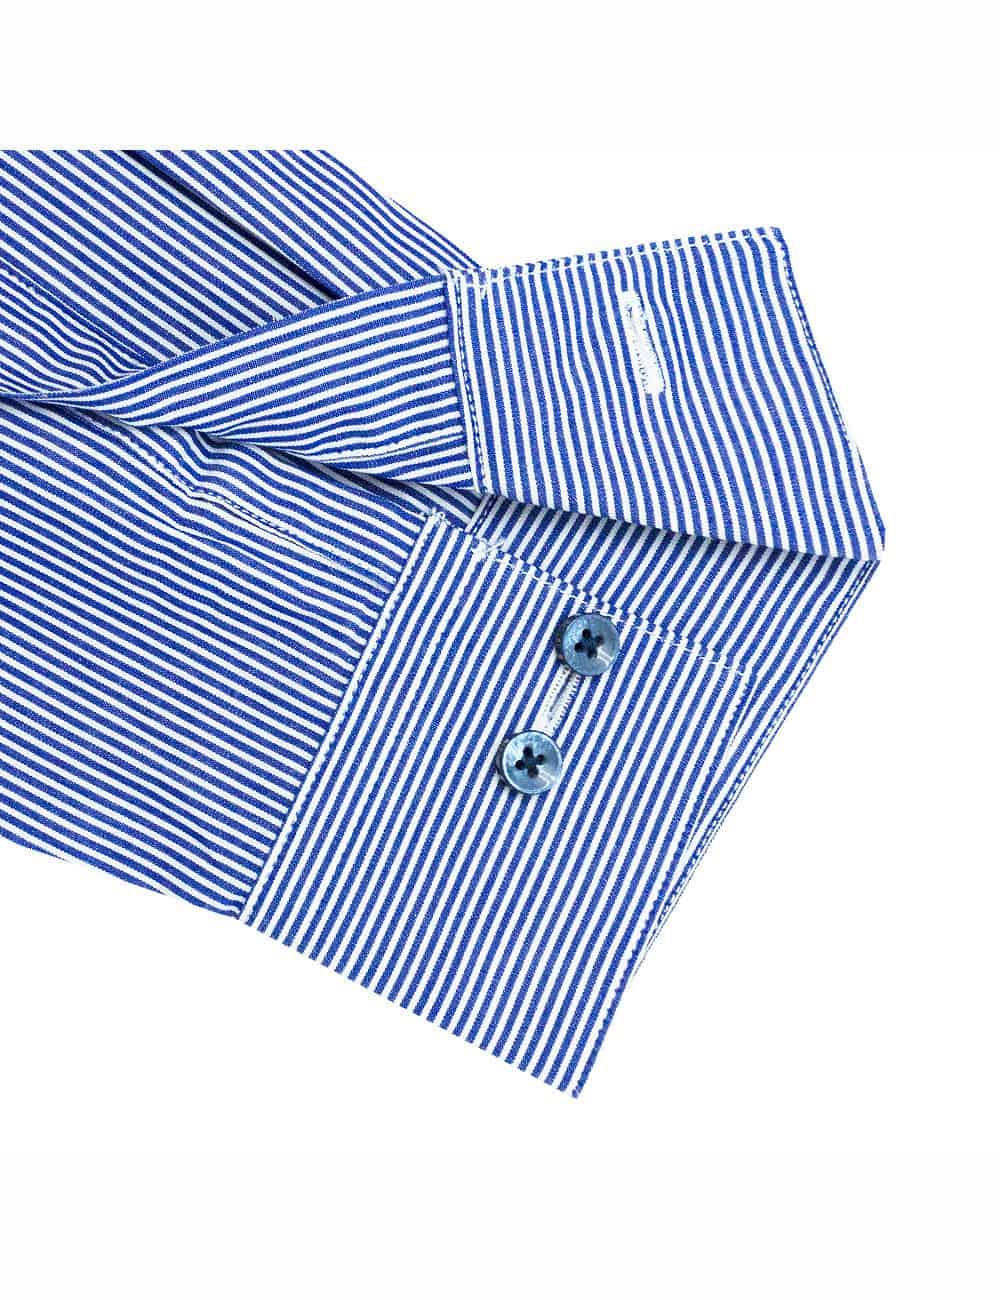 CF White and Navy Wingtip Collar 100% Premium Cotton Long Sleeve Single Cuff Shirt CF14G7.5